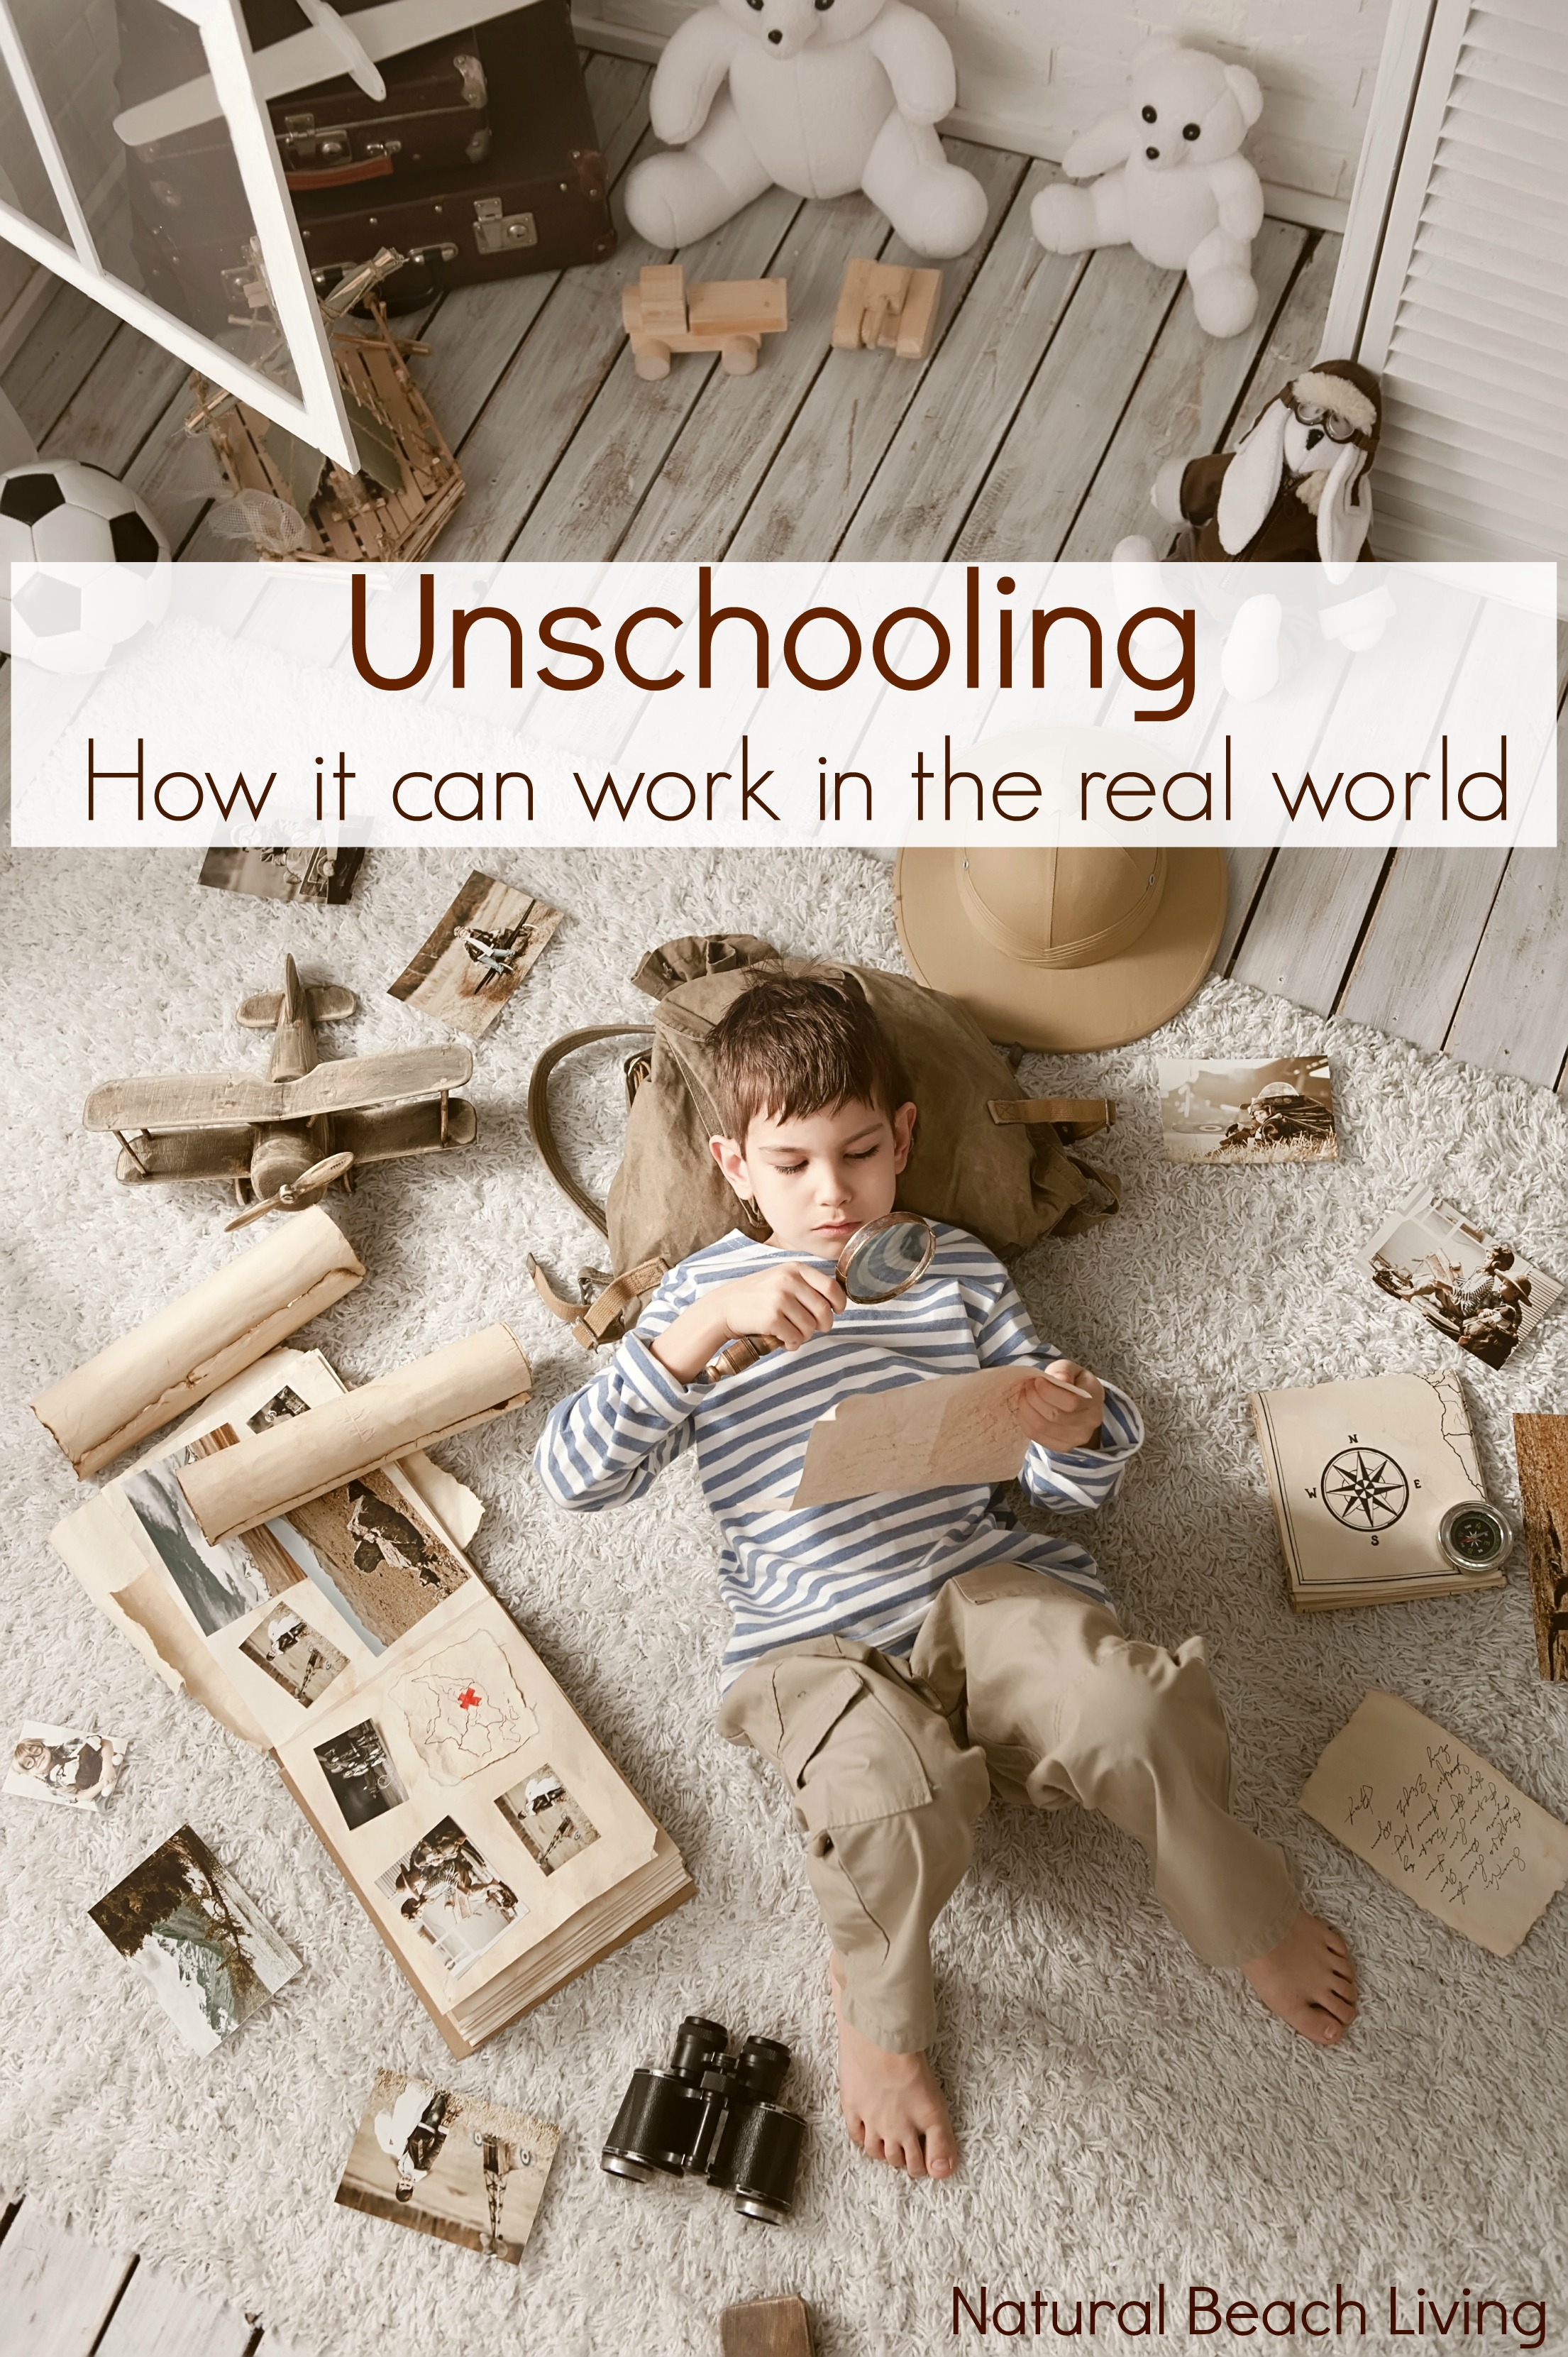 Homeschool Methods, Teaching Methods, Homeschooling styles, Montessori, Unschooling, Waldorf, Charlotte Mason, Unit Studies, Classical education & more